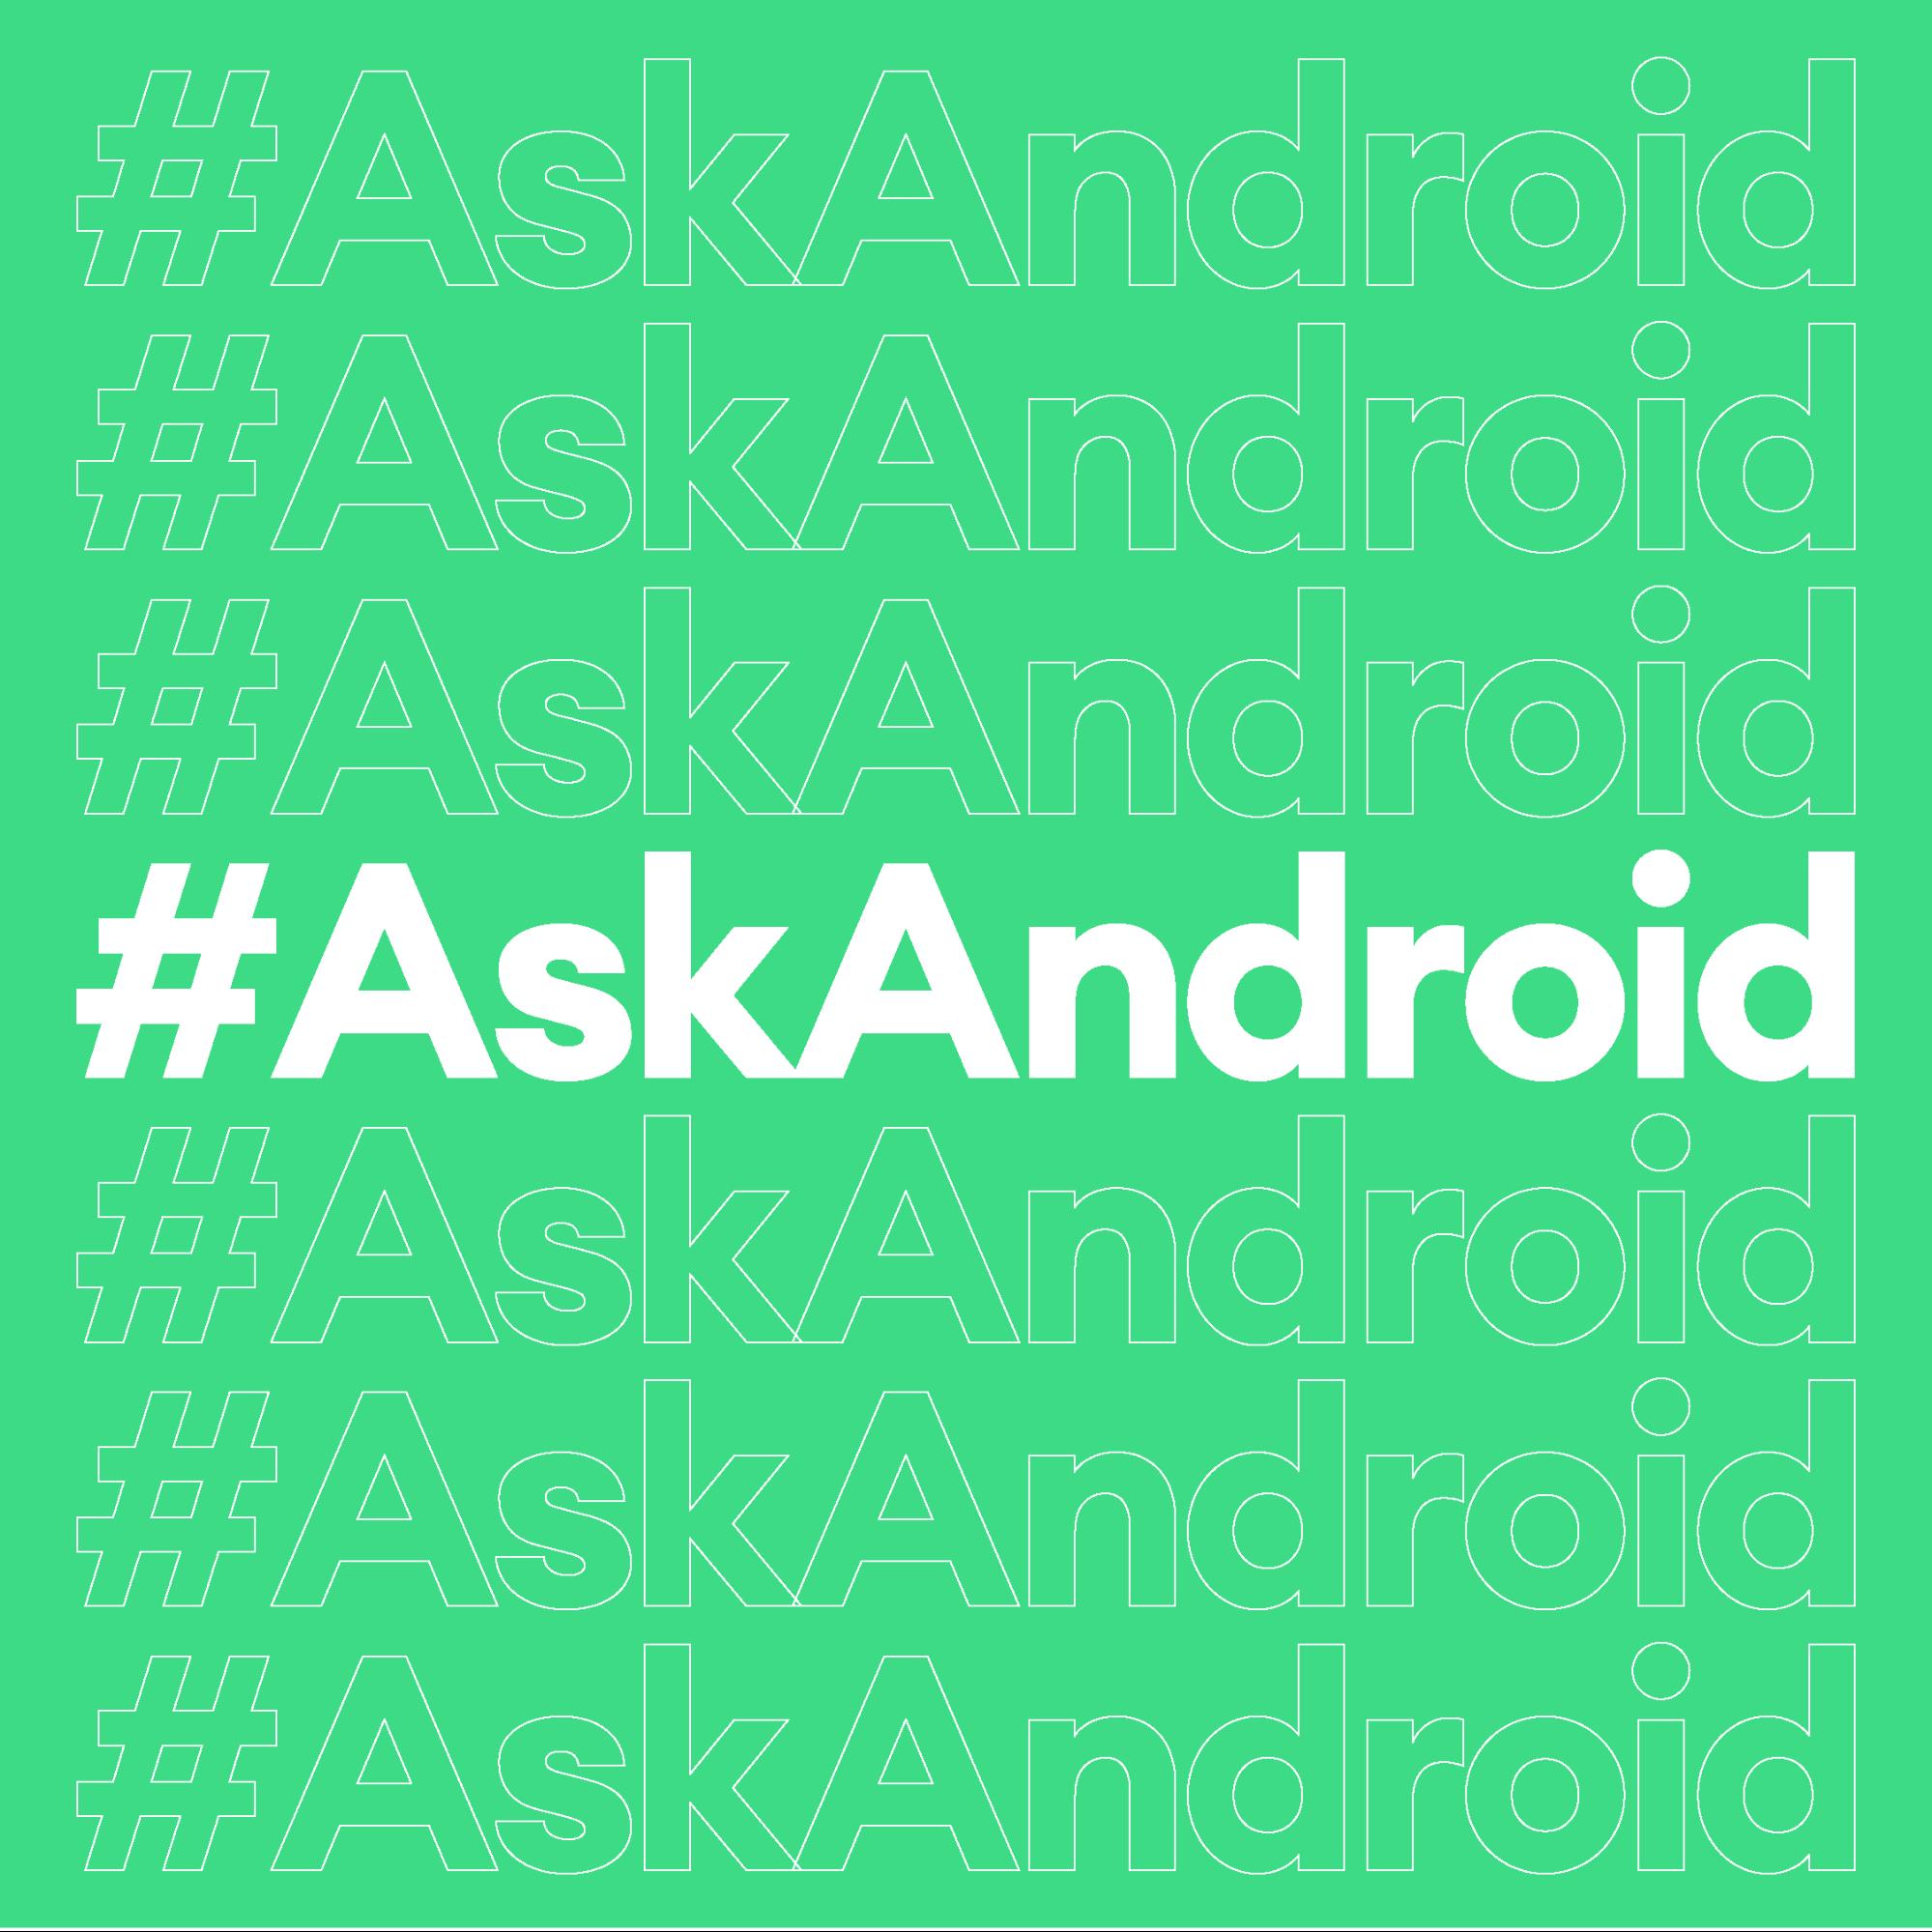 AskAndroid image